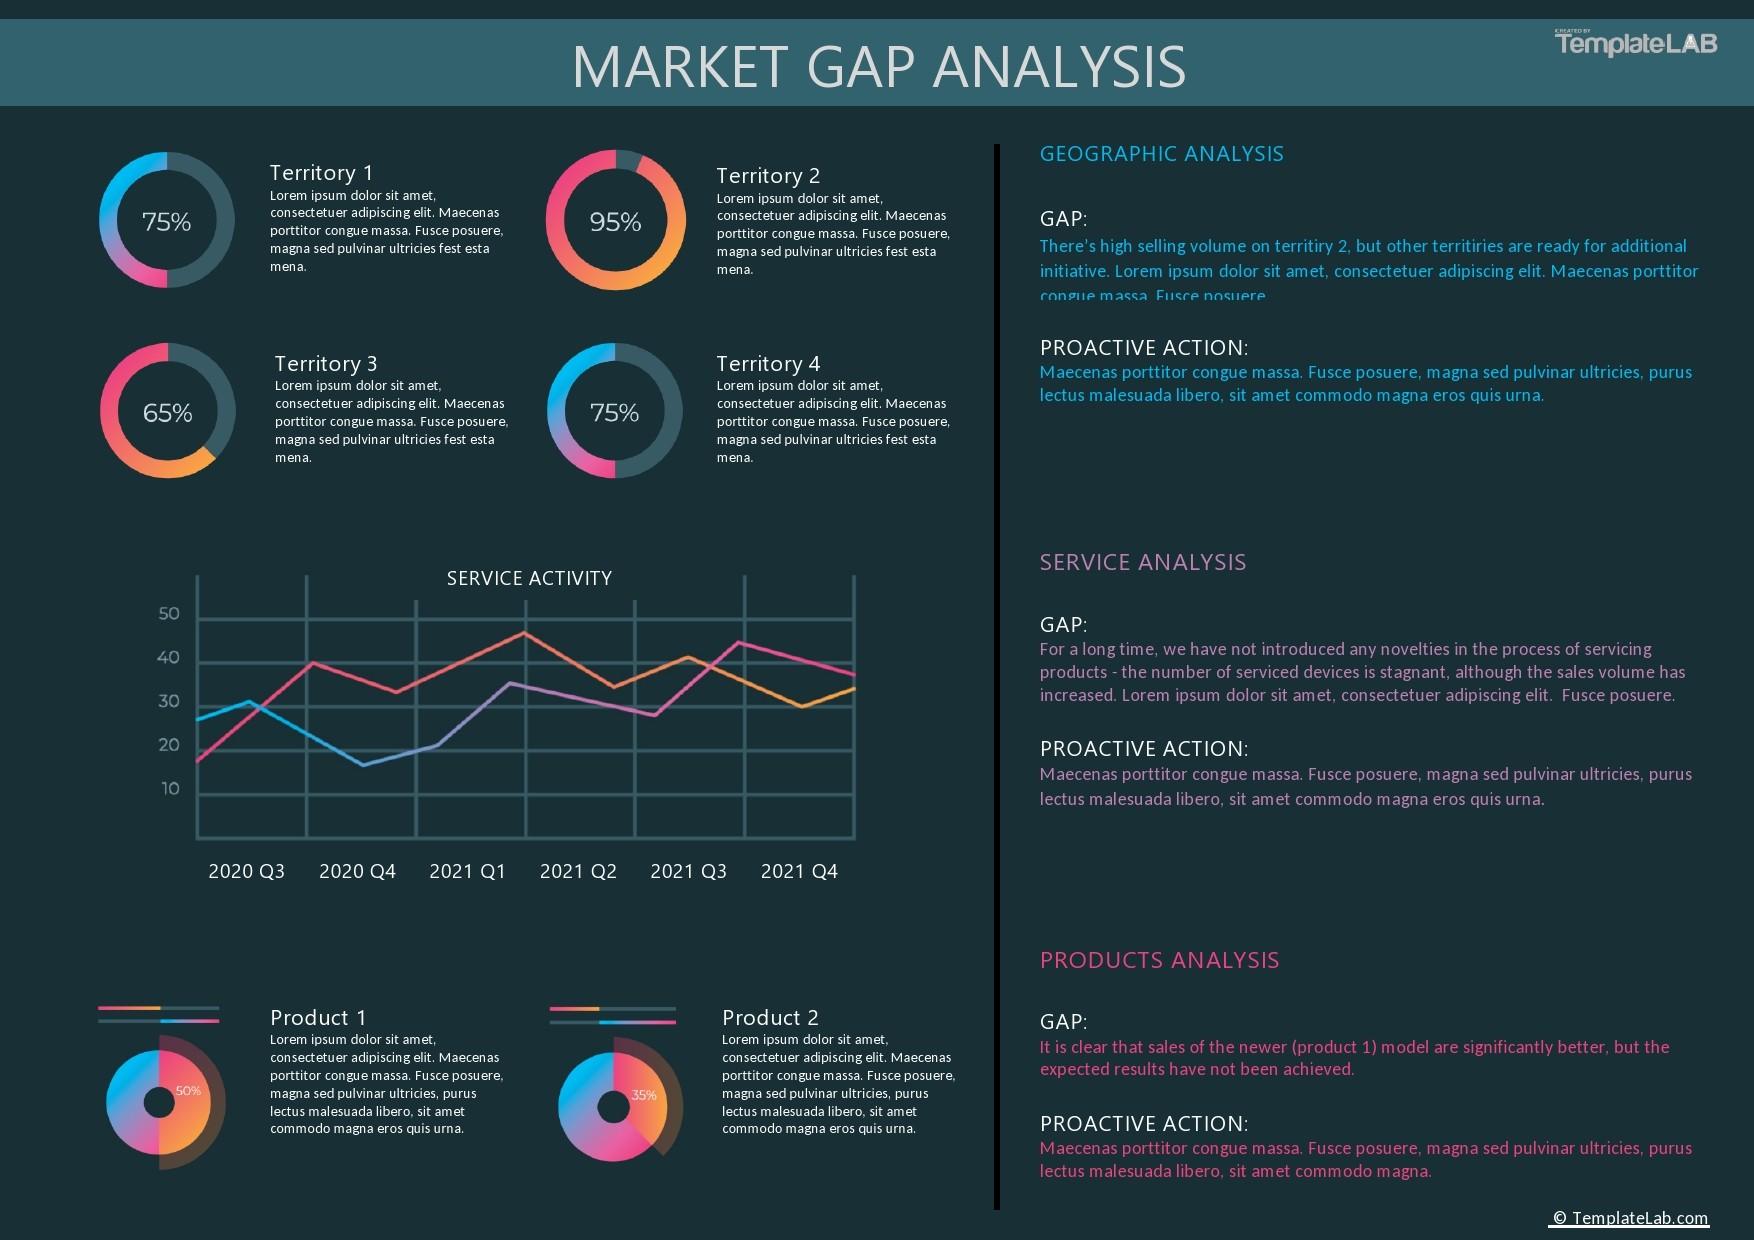 Free Market Gap Analysis Template - TemplateLab.com